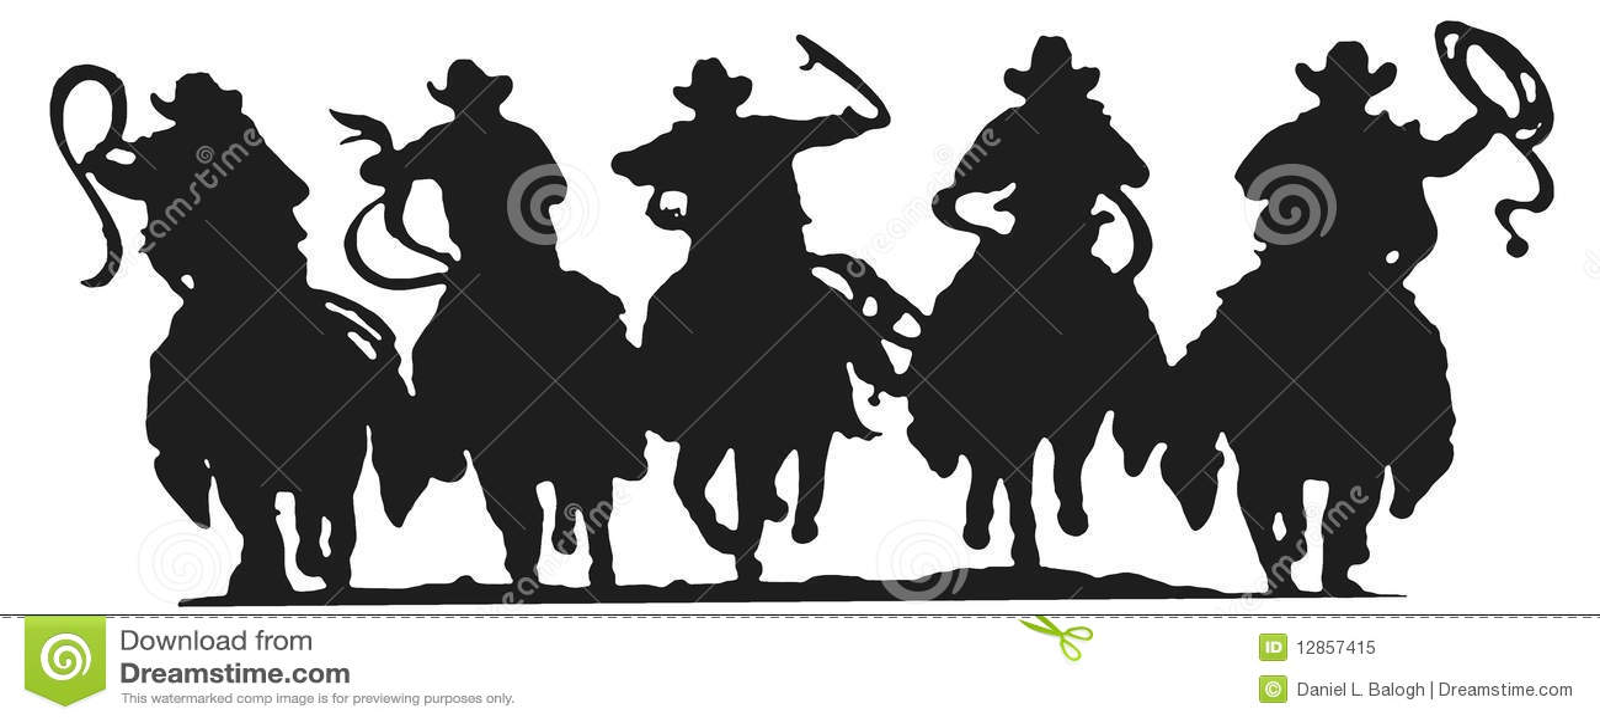 Cowboys Silhouette Royalty Free Stock Photo - Image: 12857415